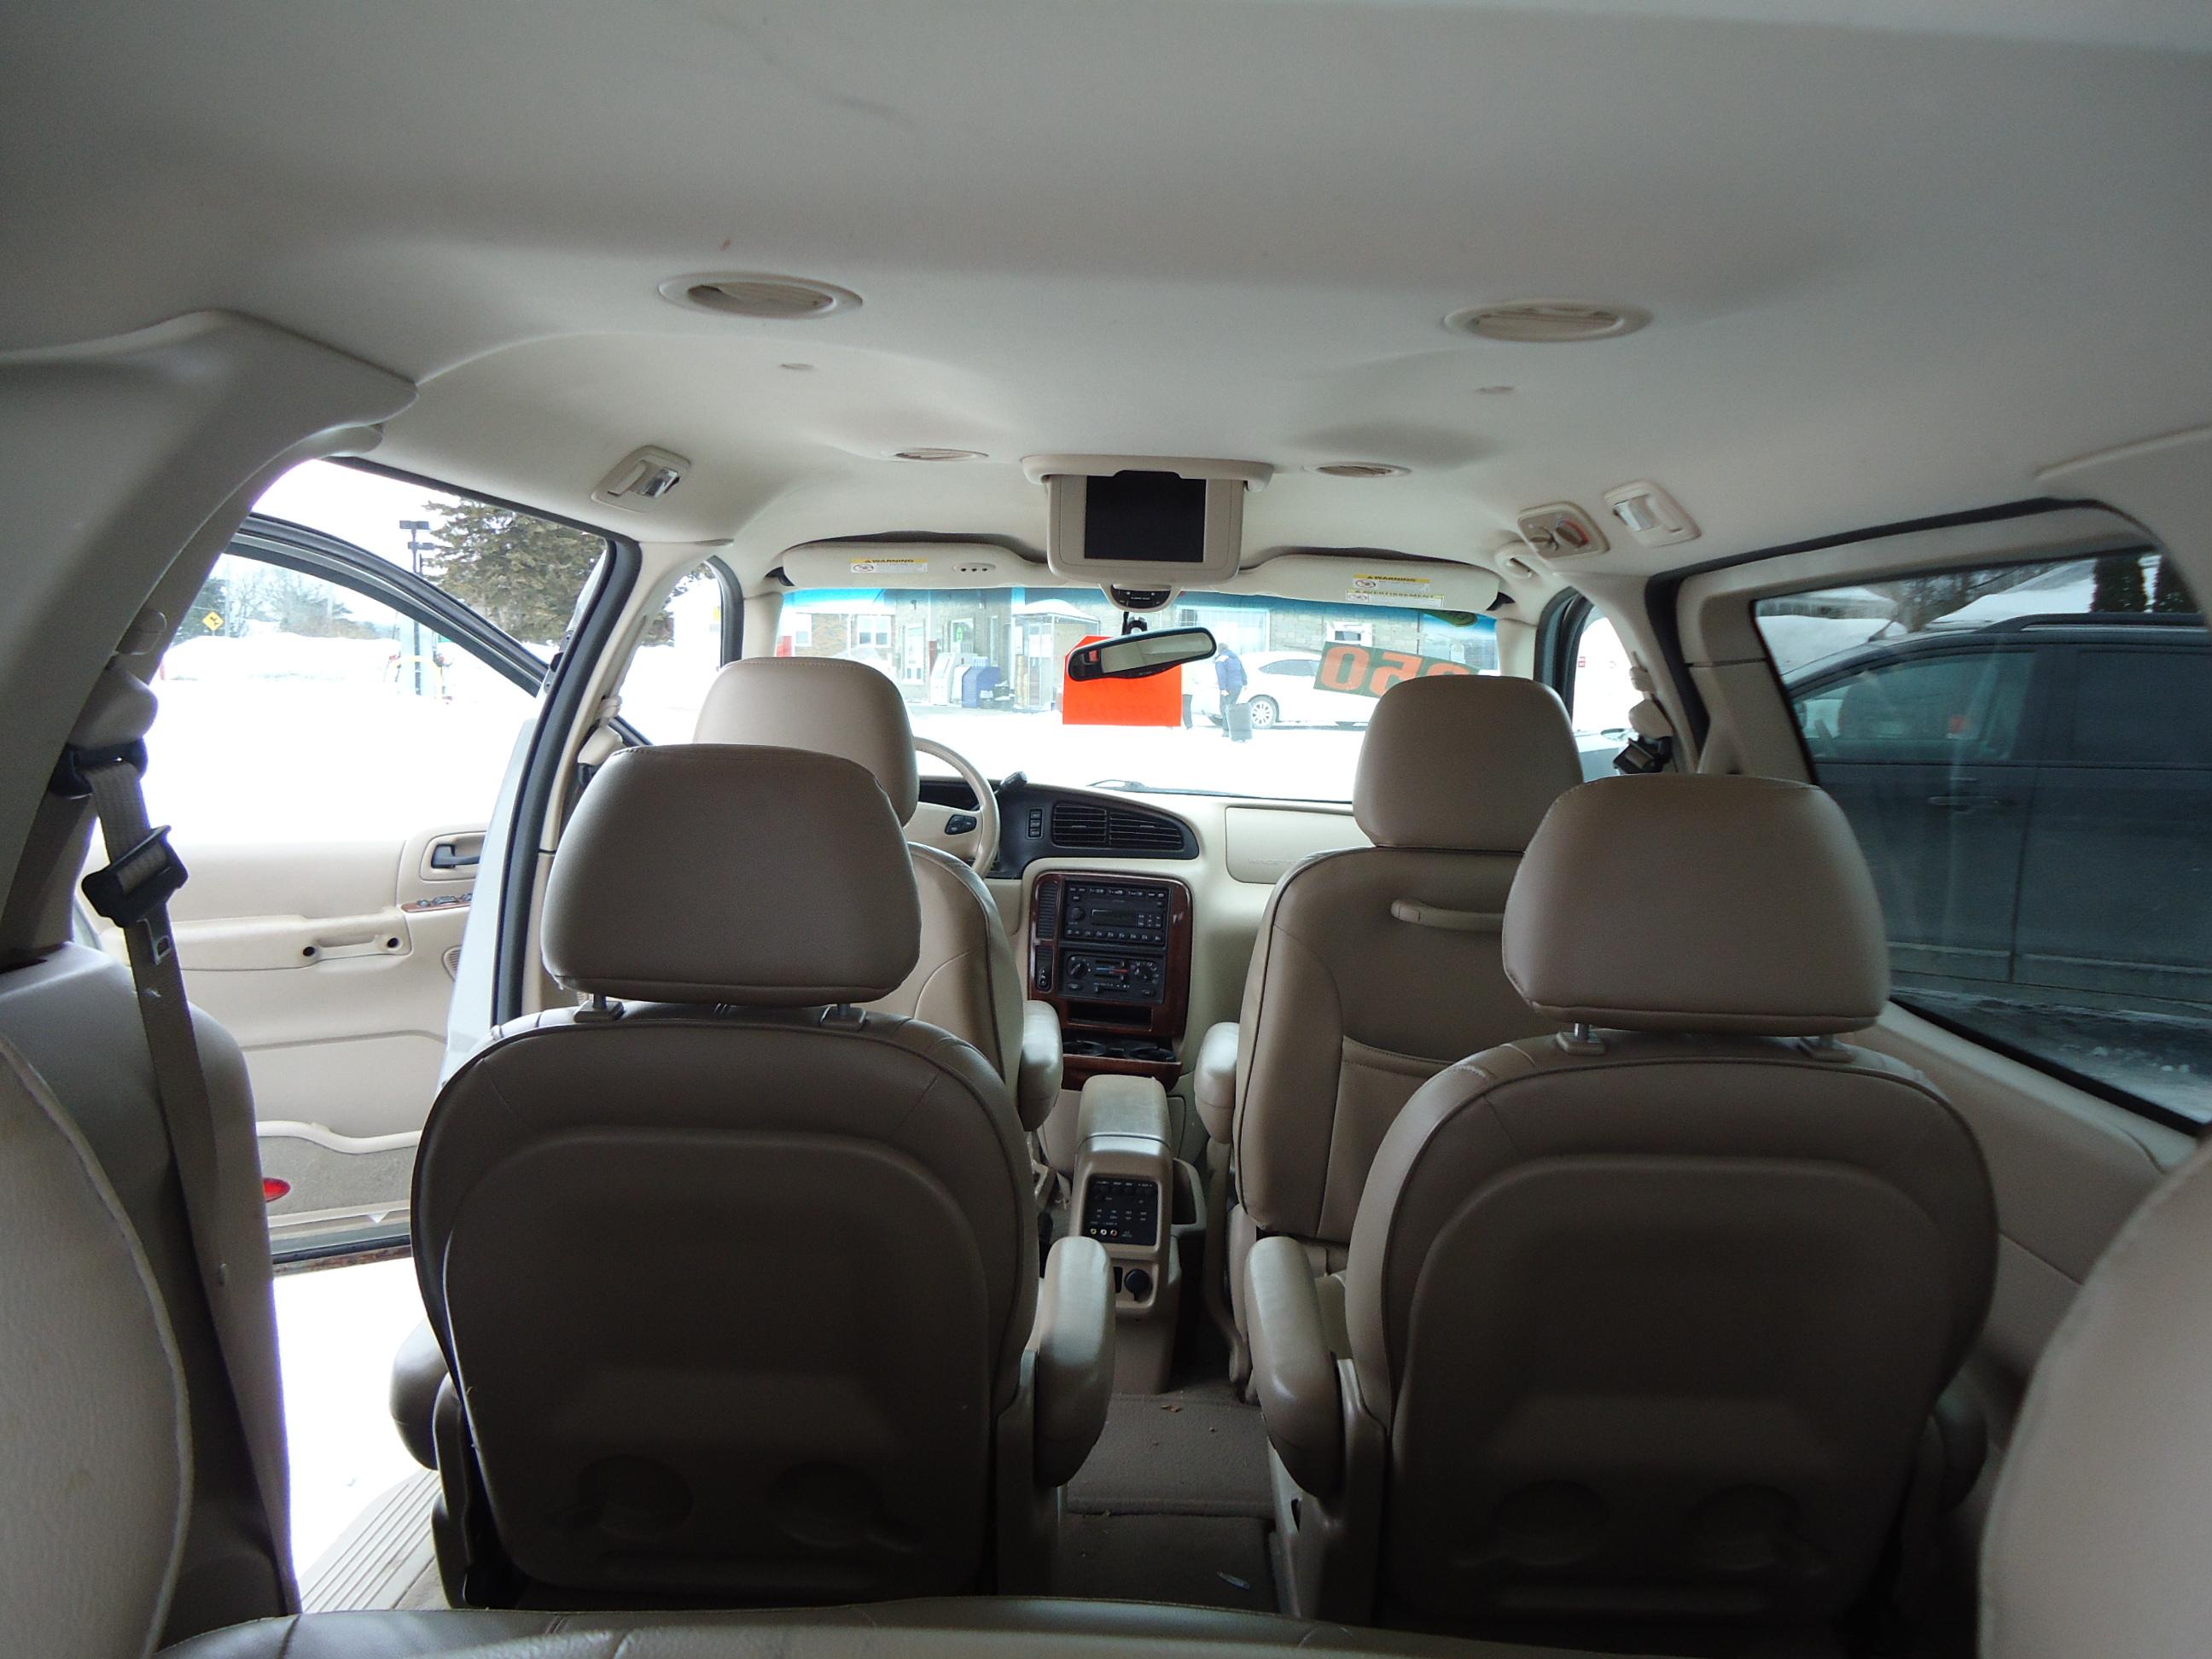 2003 Ford Windstar Sel Luxury Van 7 Bob Currie Auto Sales